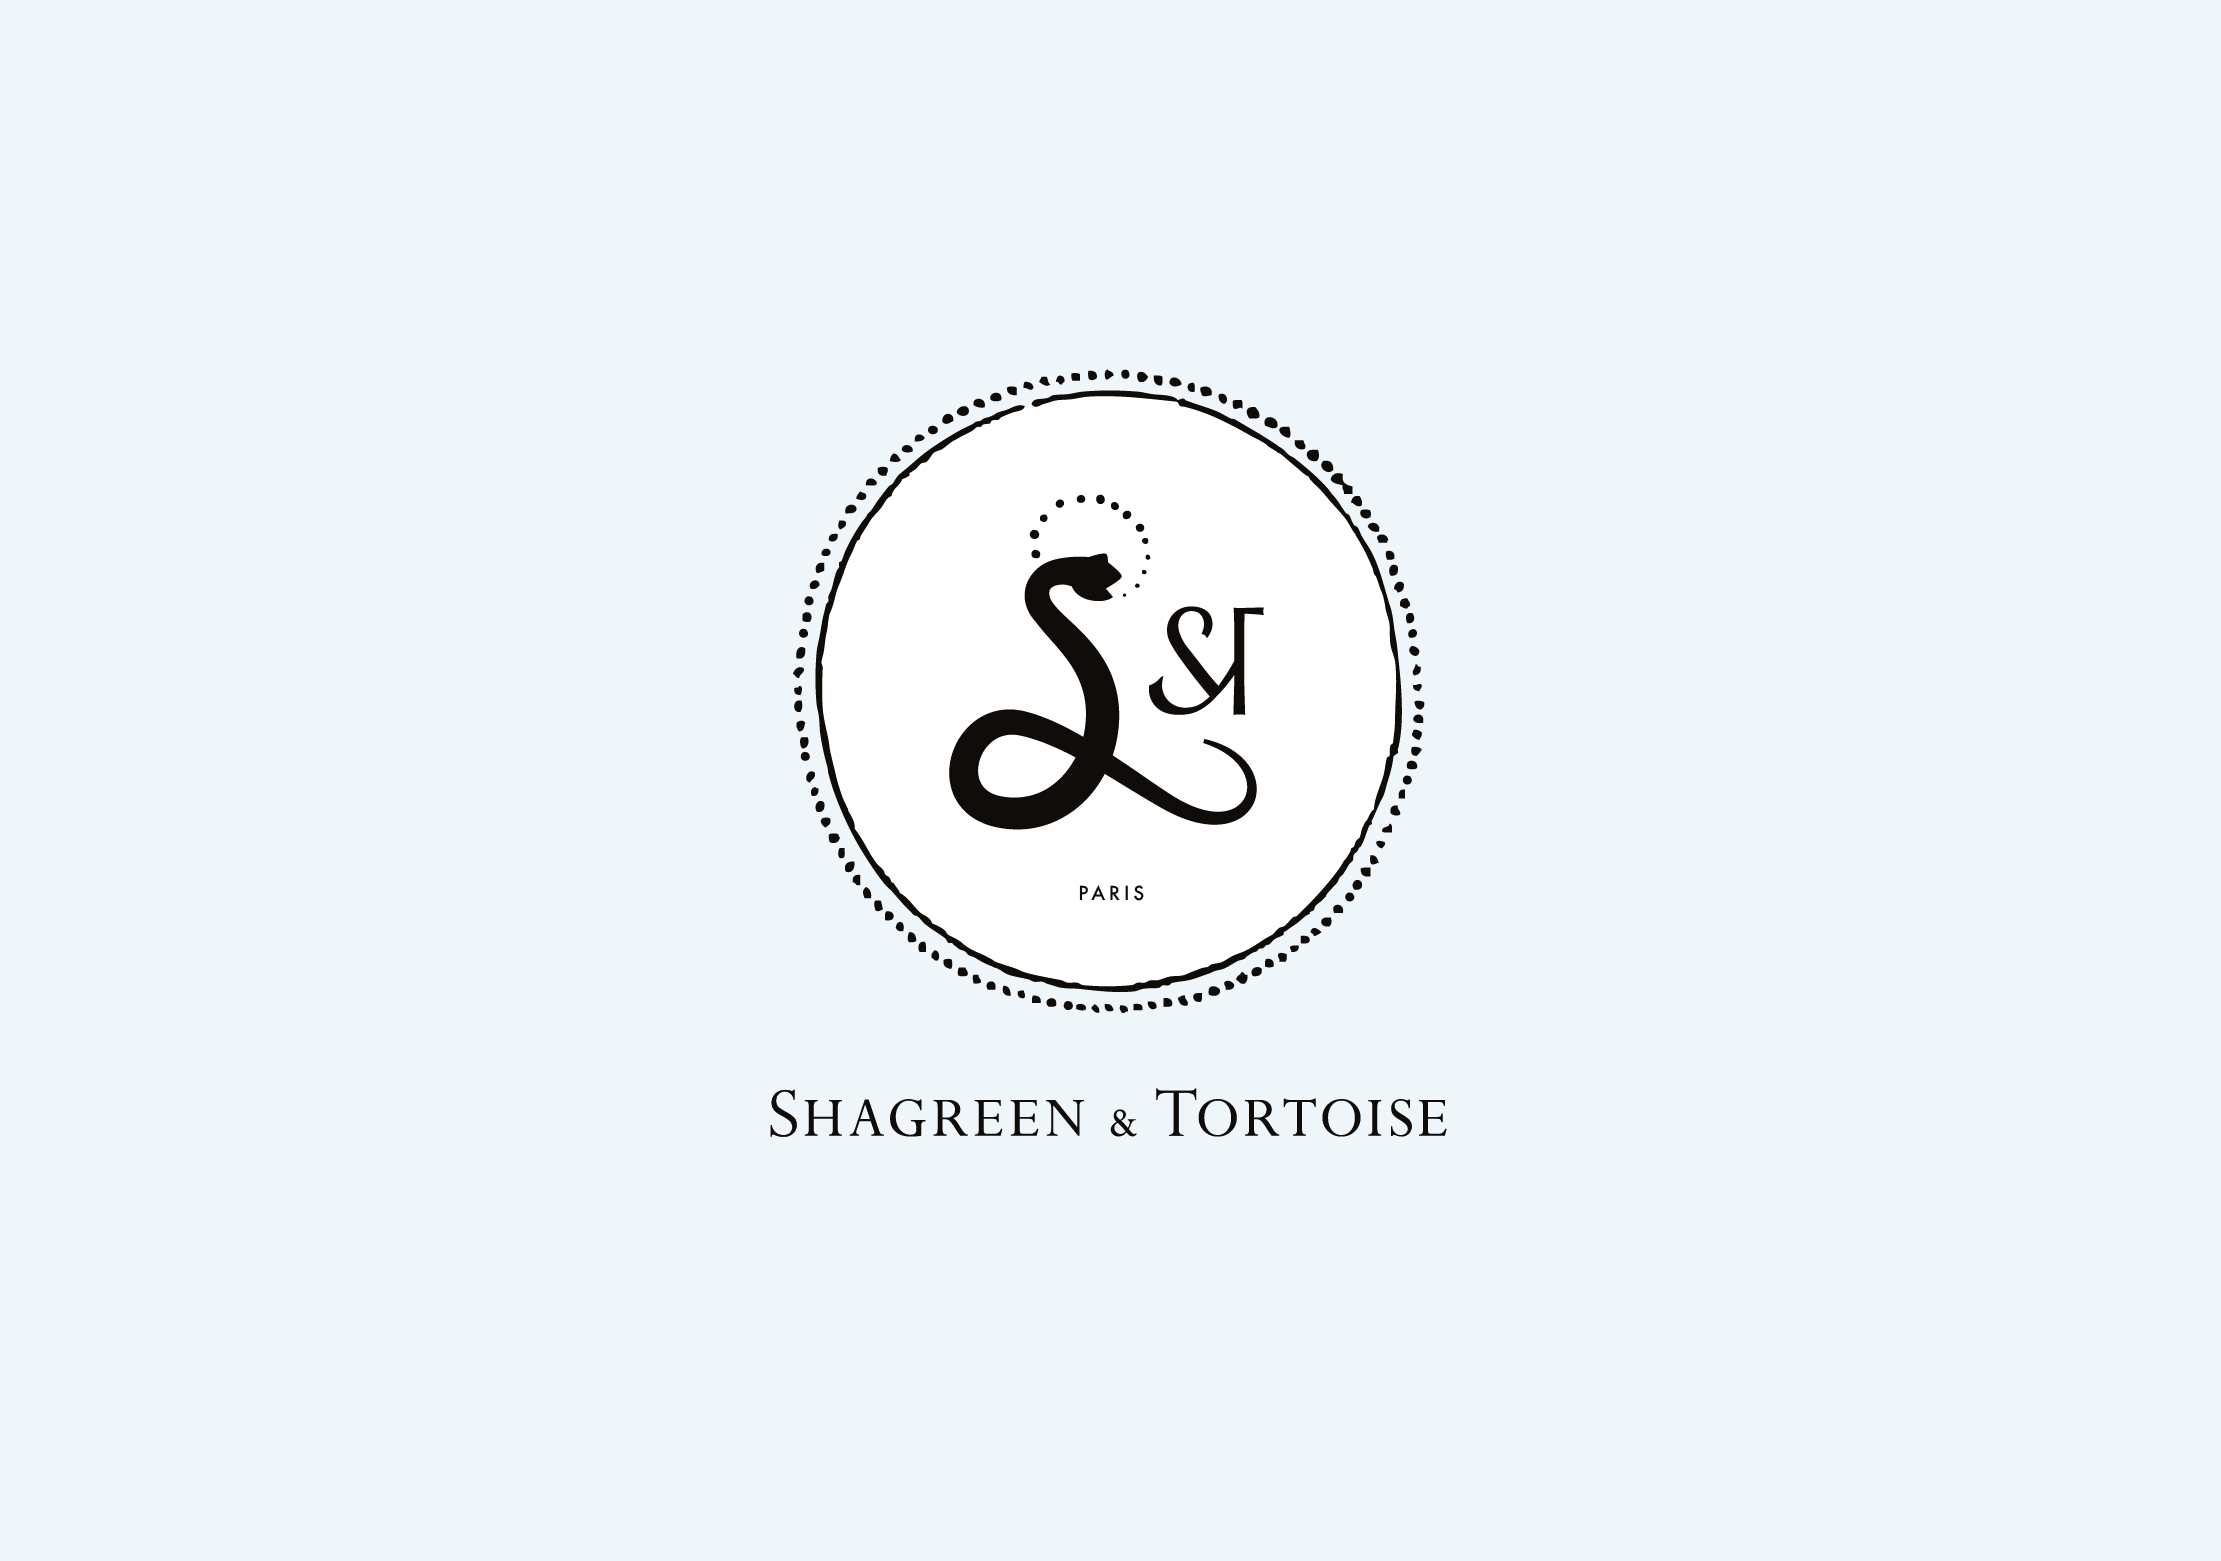 SHAGREEN & TORTOISE